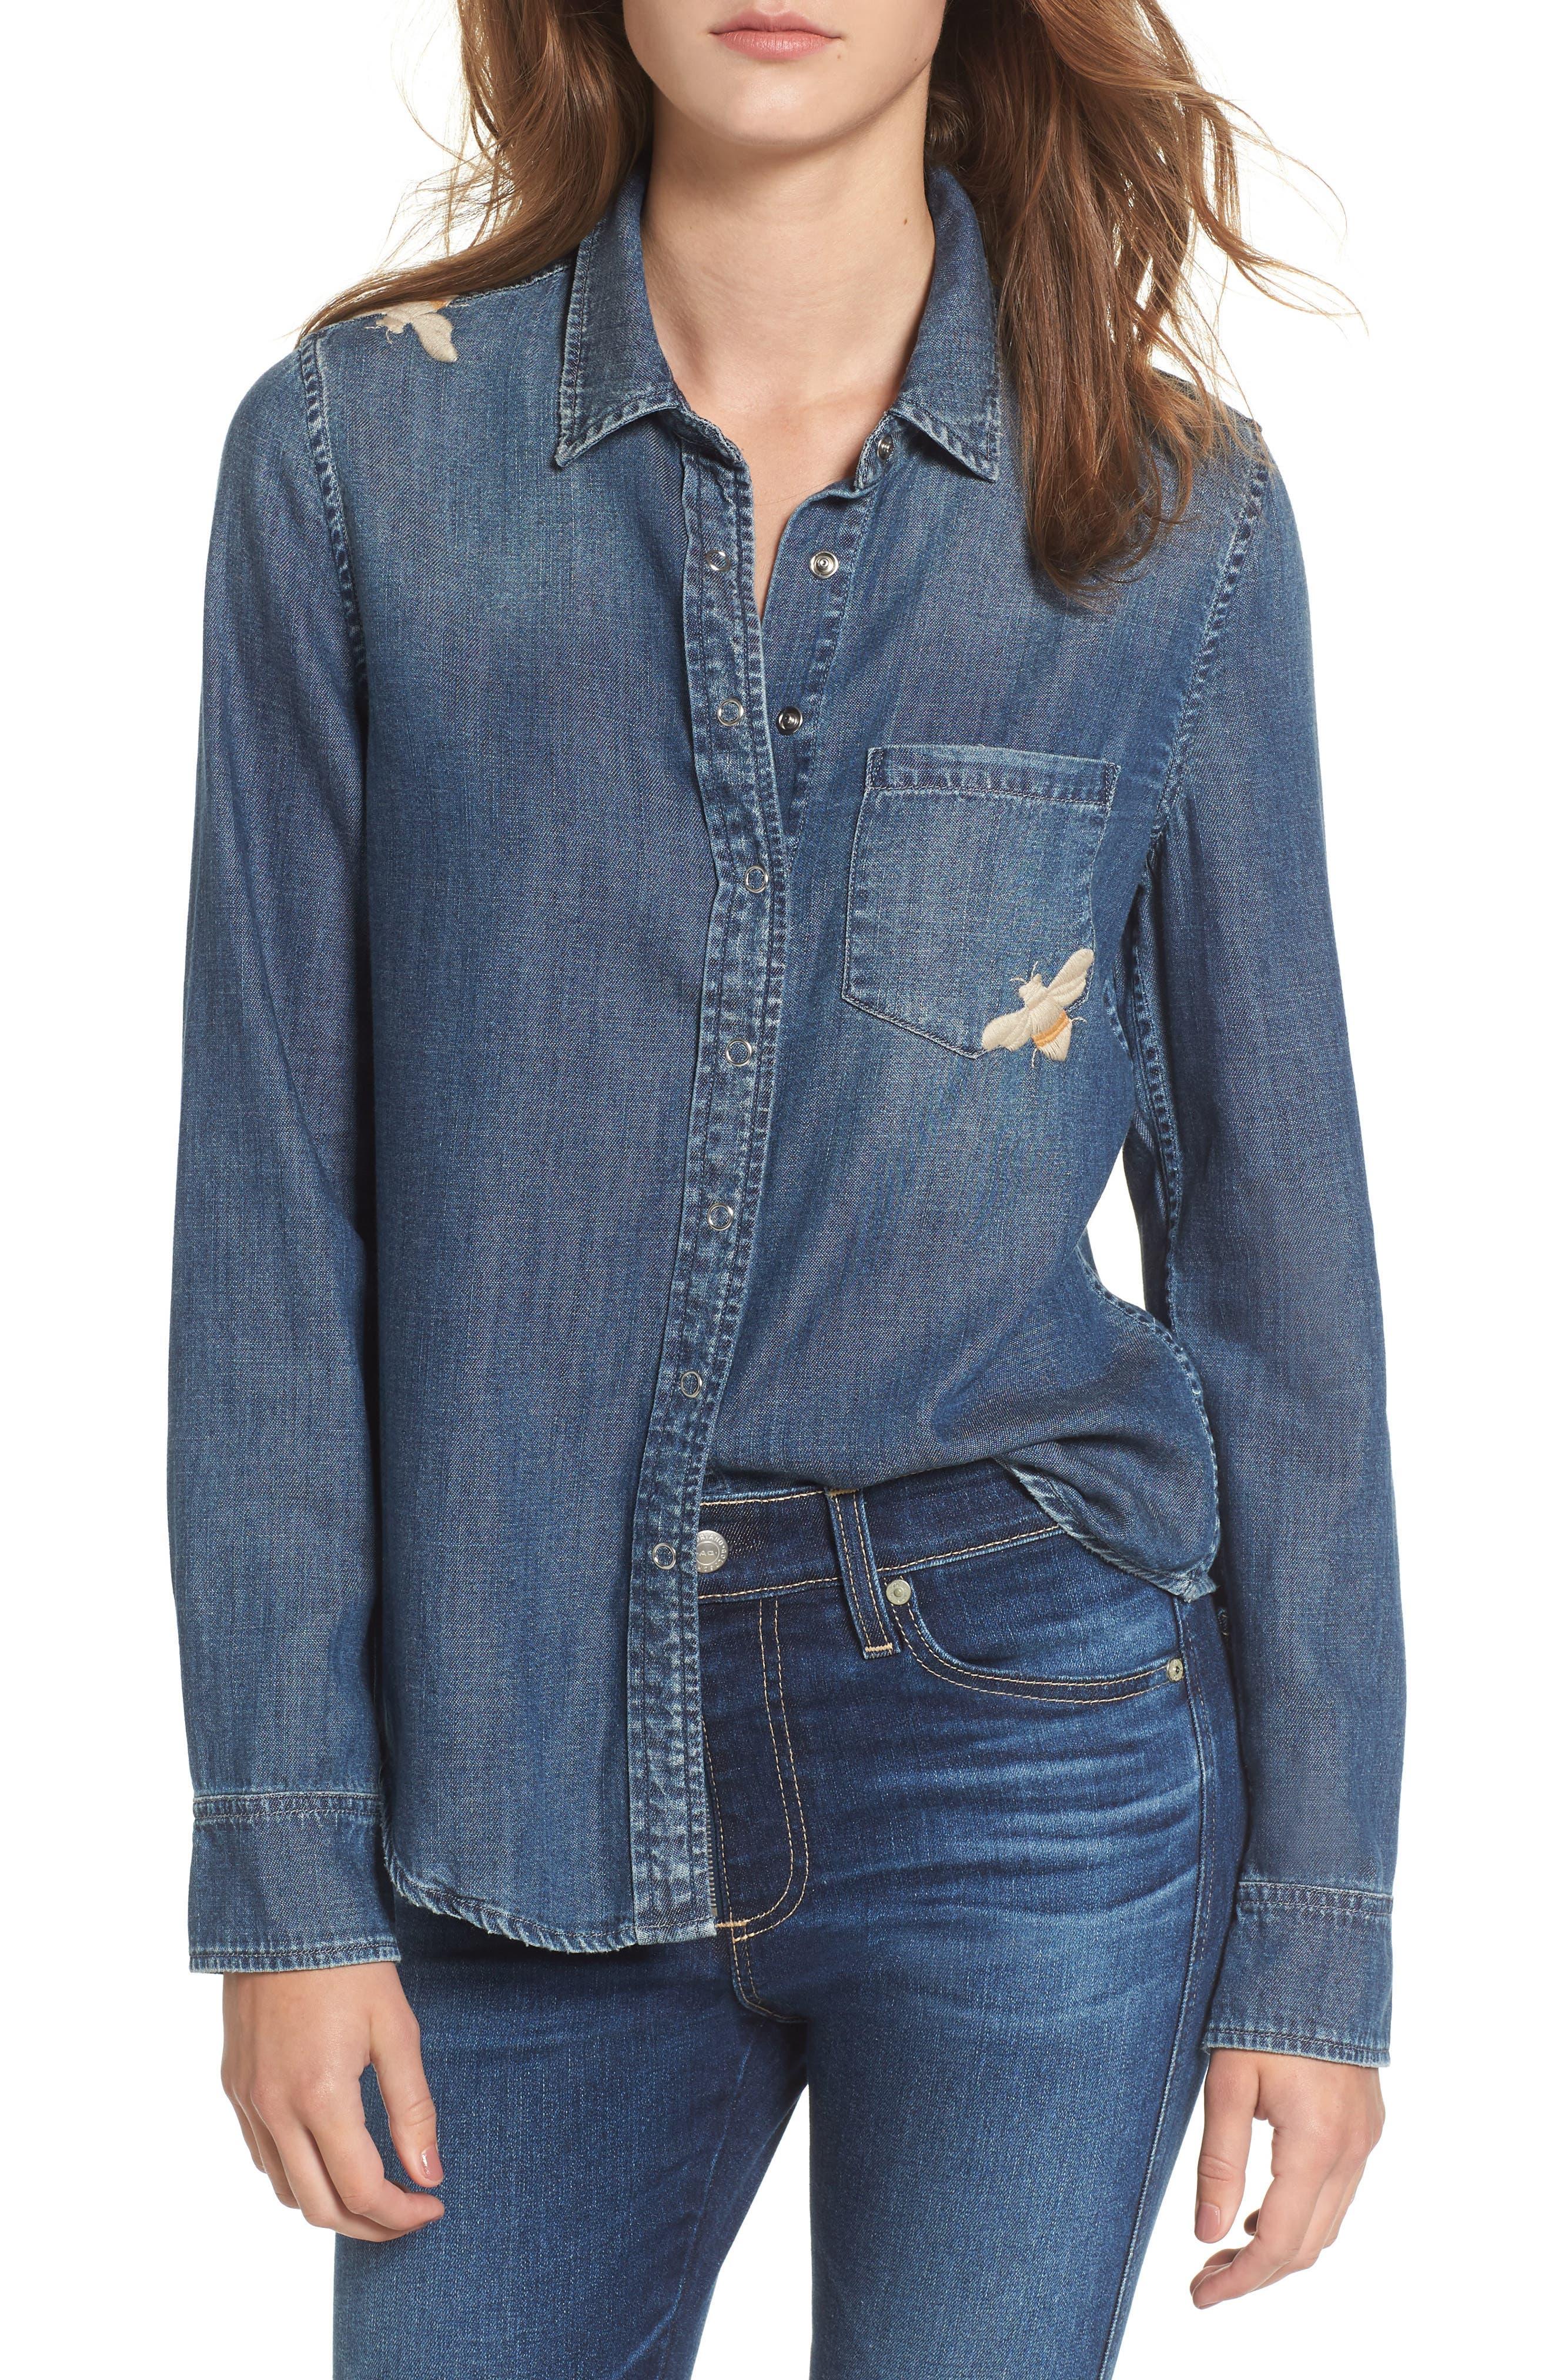 Alternate Image 1 Selected - AG Joanna Embroidered Denim Shirt